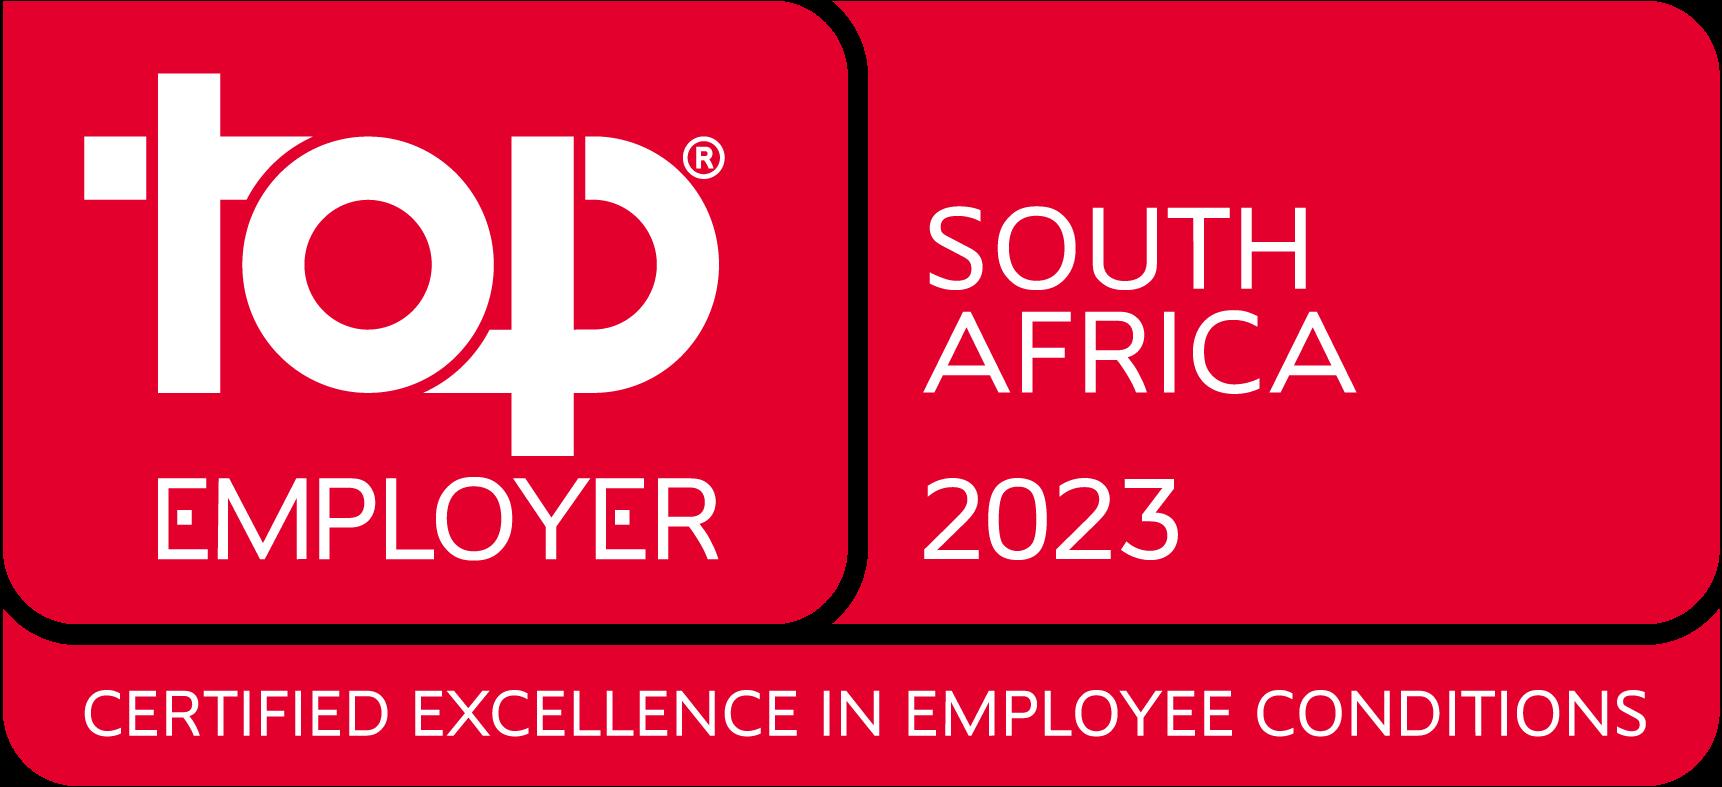 Top employer award